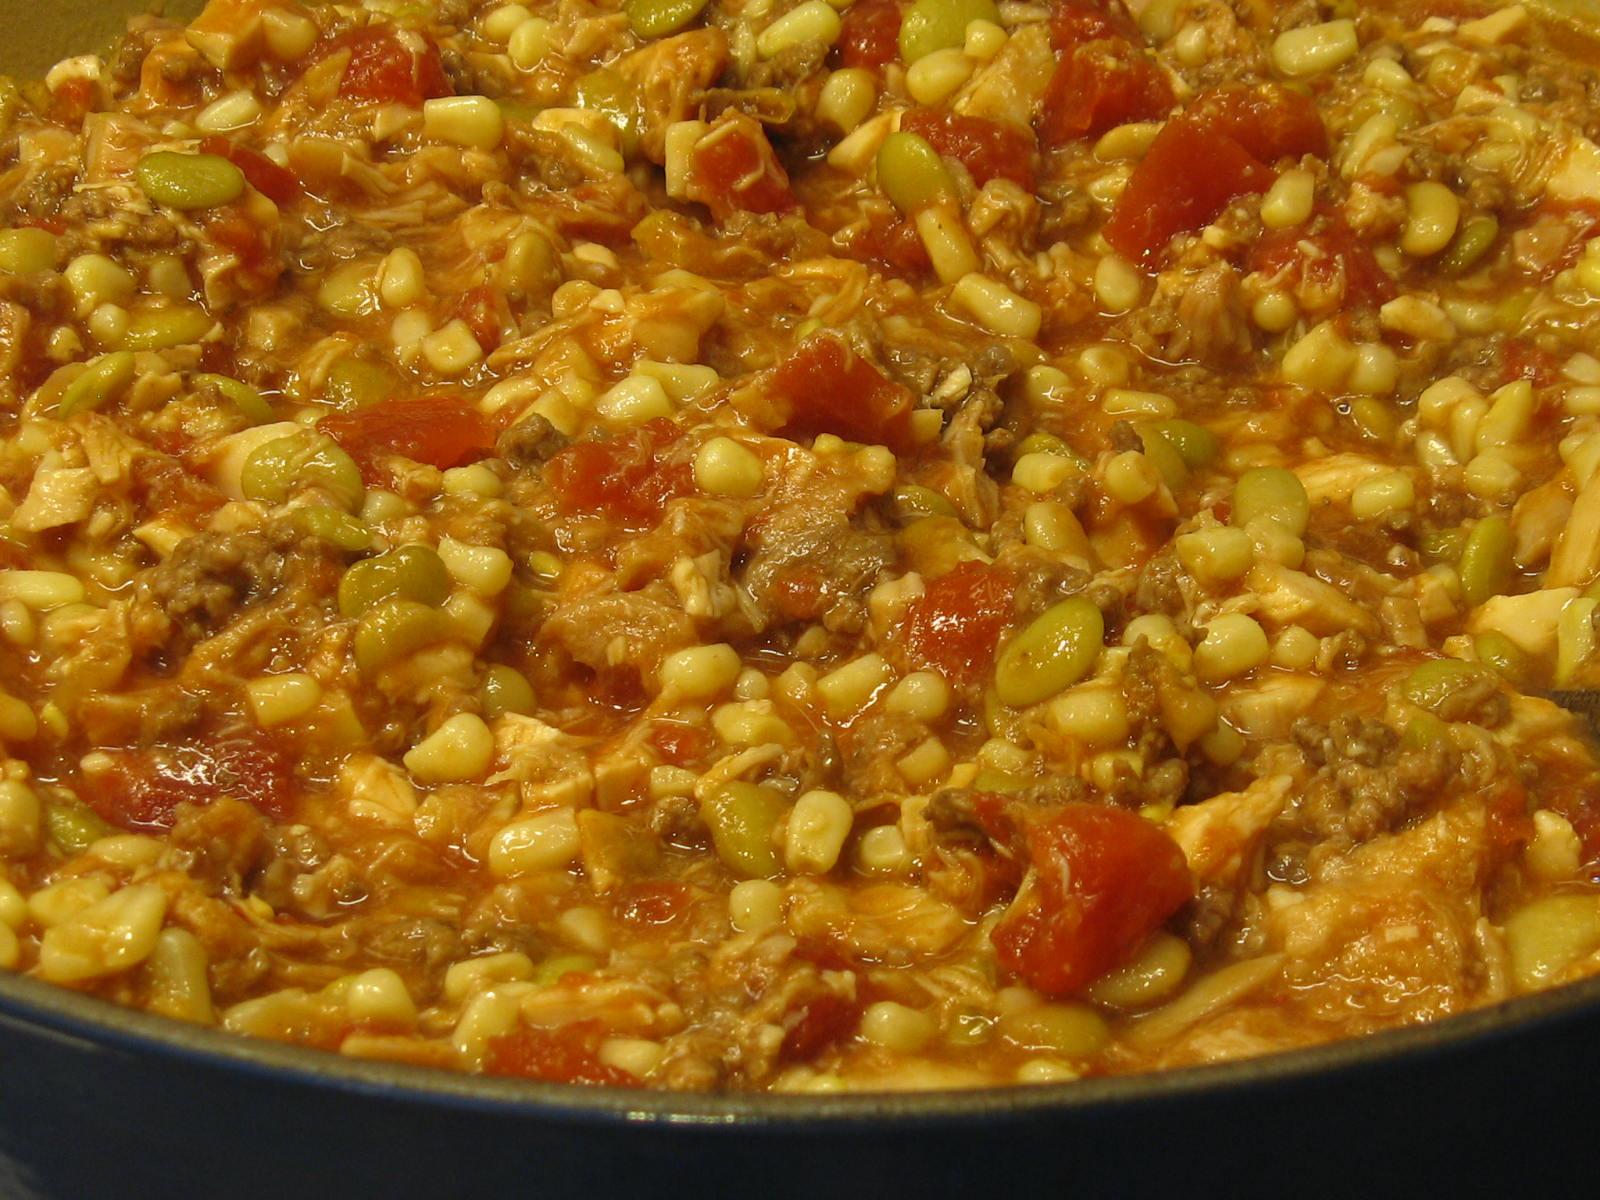 North Carolina Brunswick Stew  Cora Cooks Brunswick Stew A Year Round Favorite From